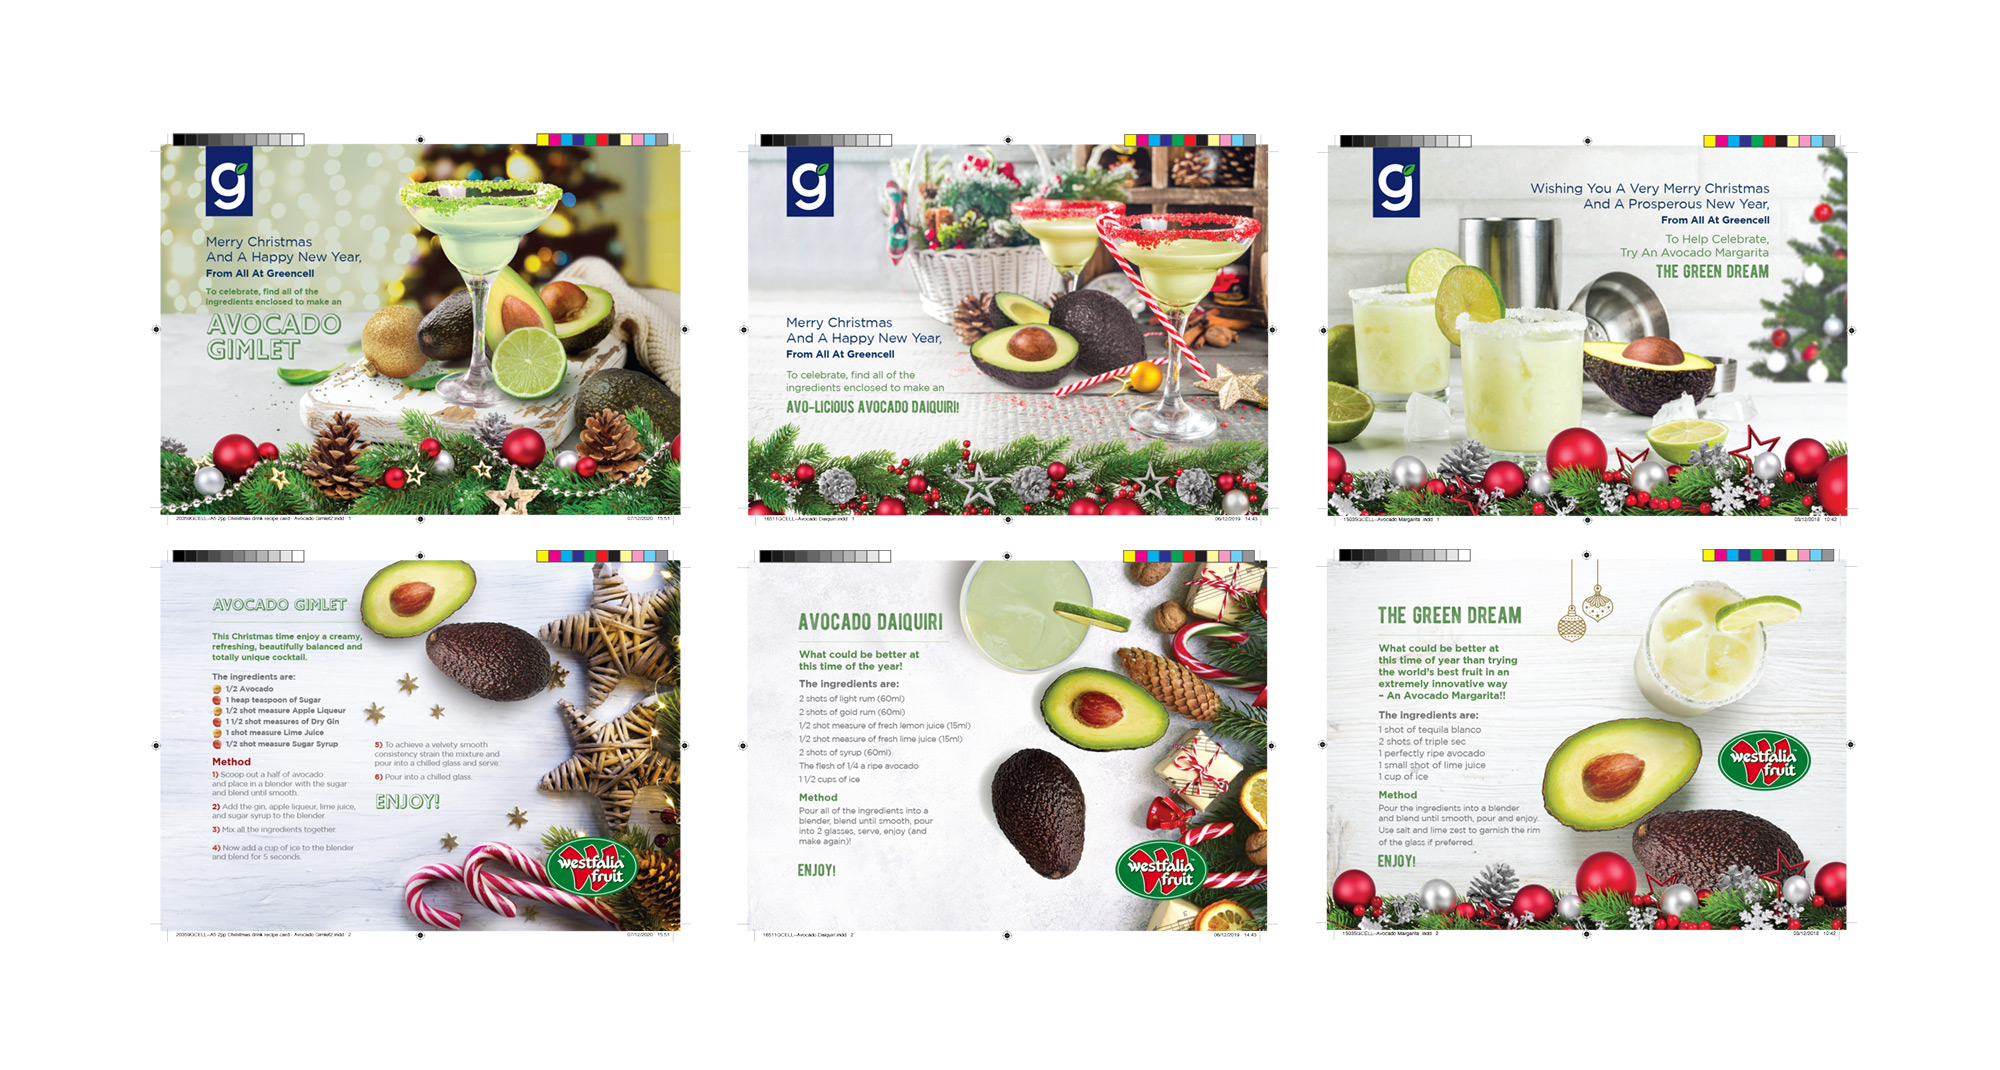 Greencell Literature adverts